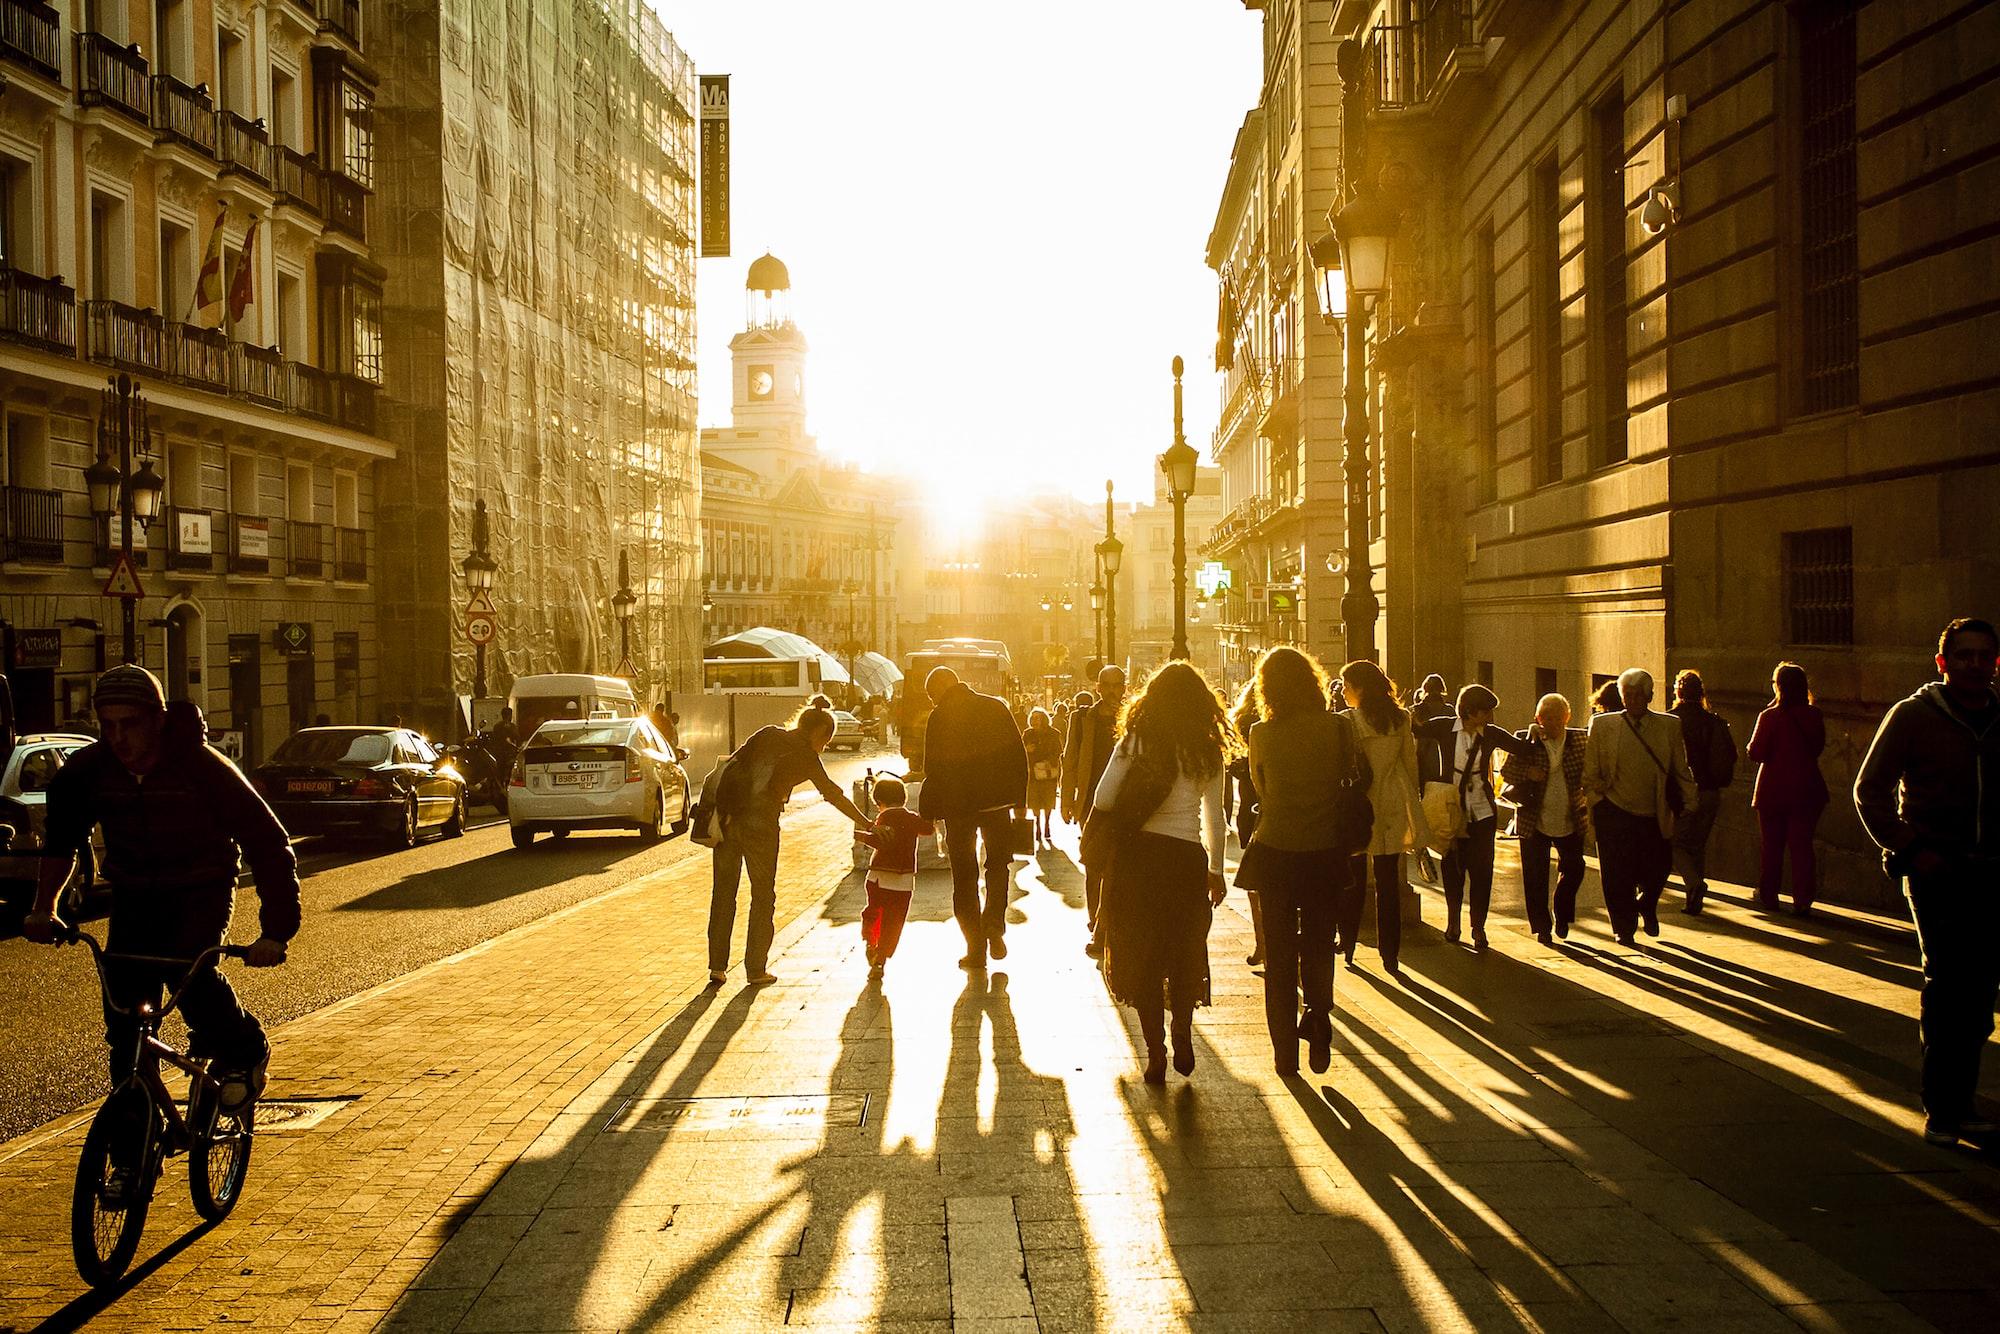 Street in Madrid, golden hour. people walking, bike